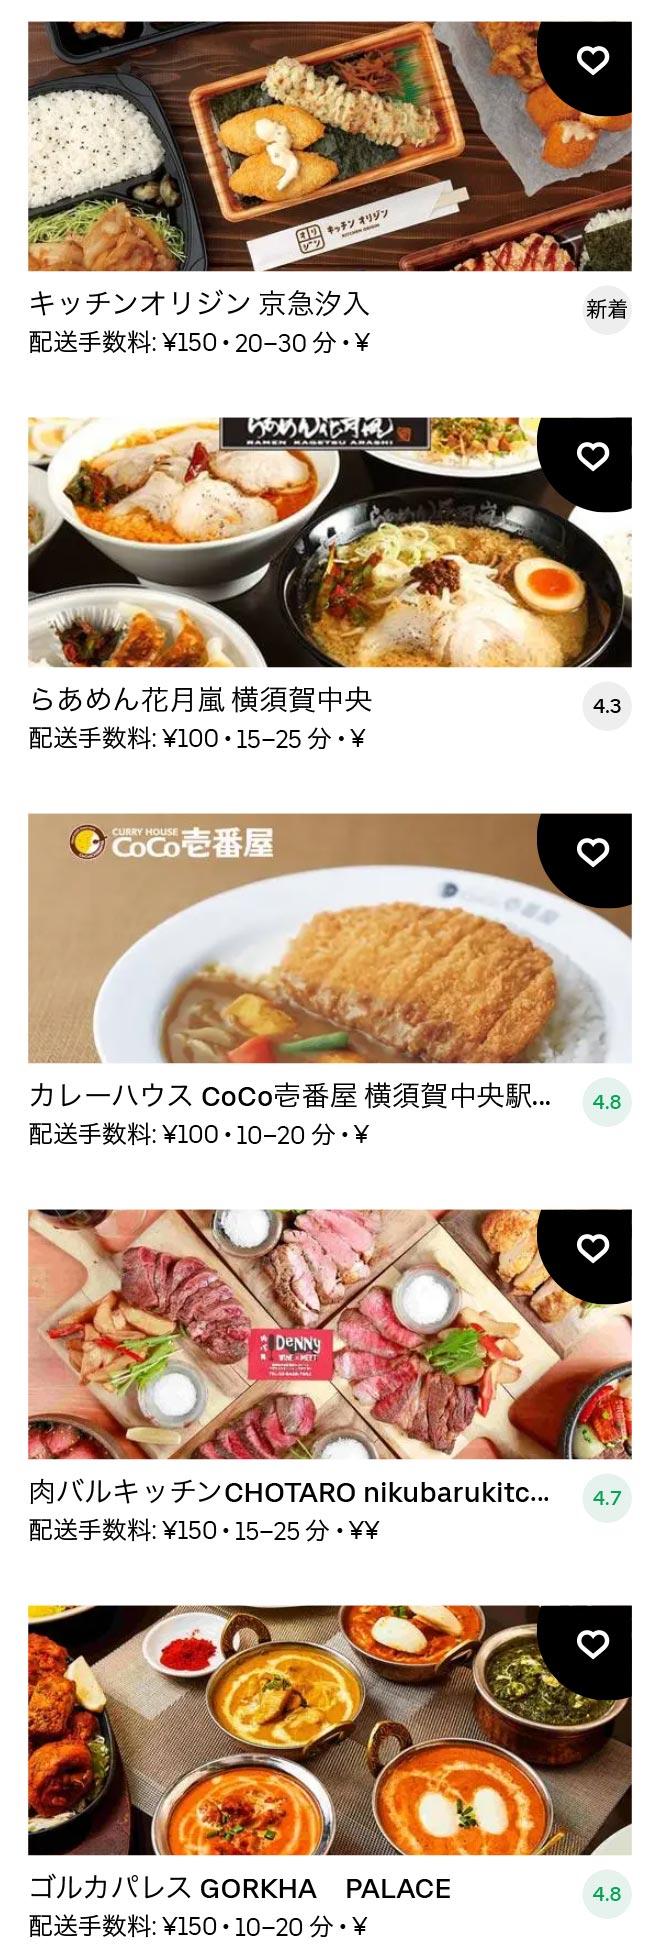 Yokosuka chuo menu 2011 02